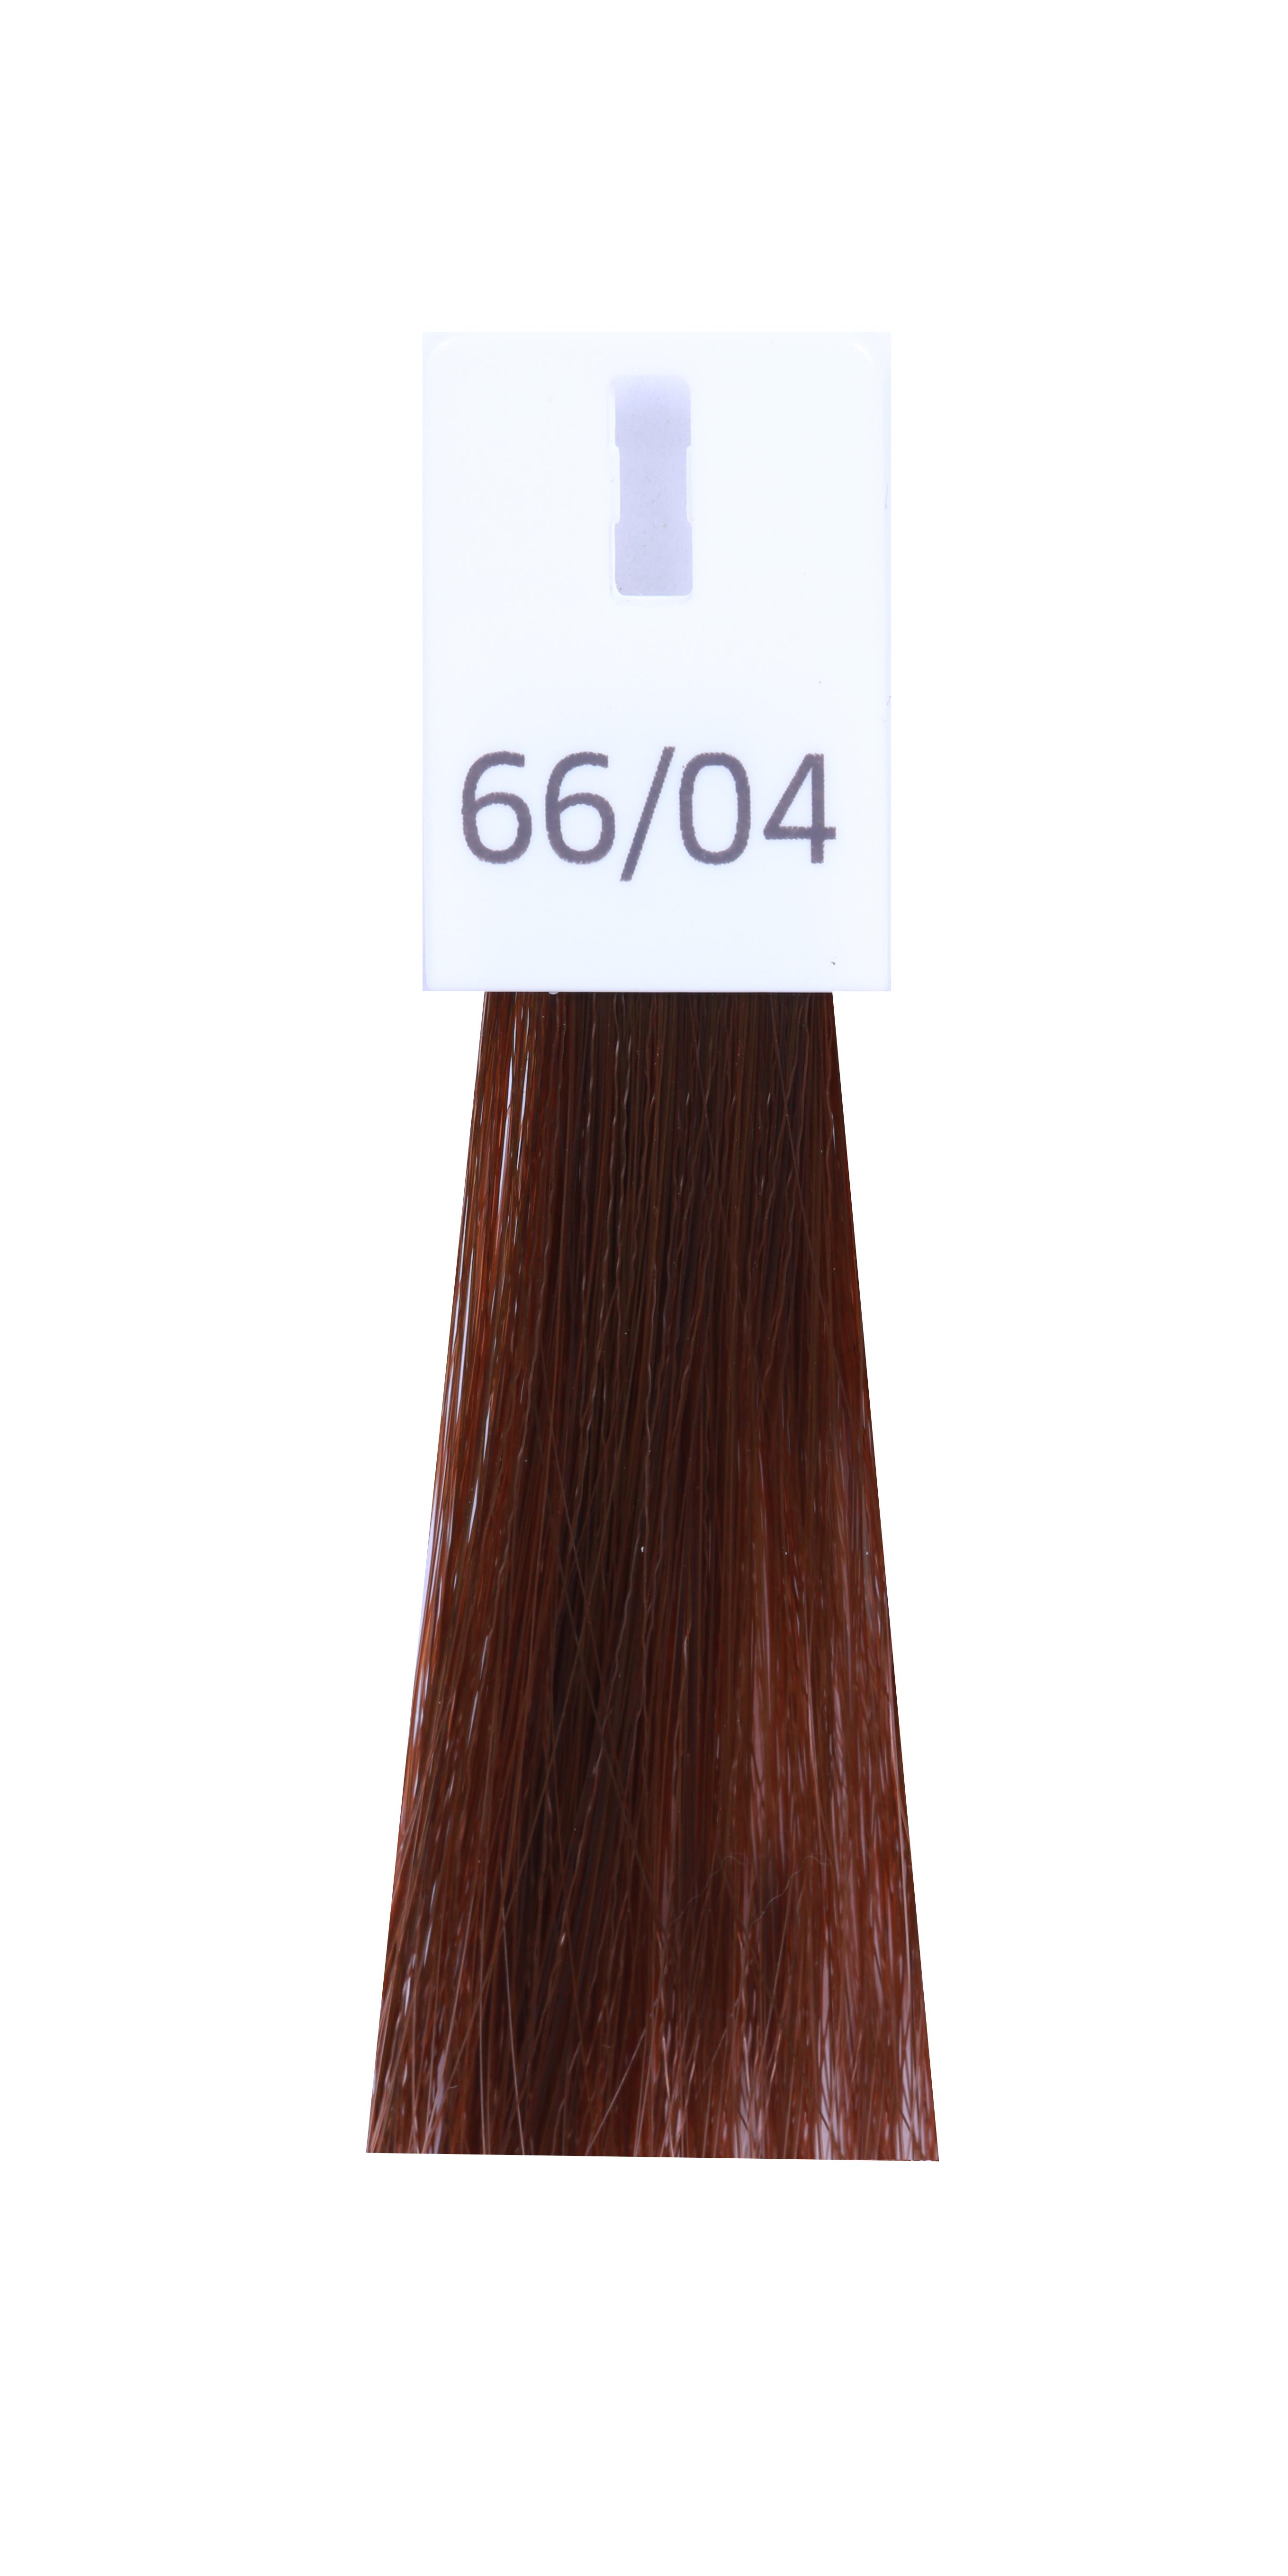 WELLA PROFESSIONALS 66/04 краска для волос коньяк / Color Touch Plus 60 мл.